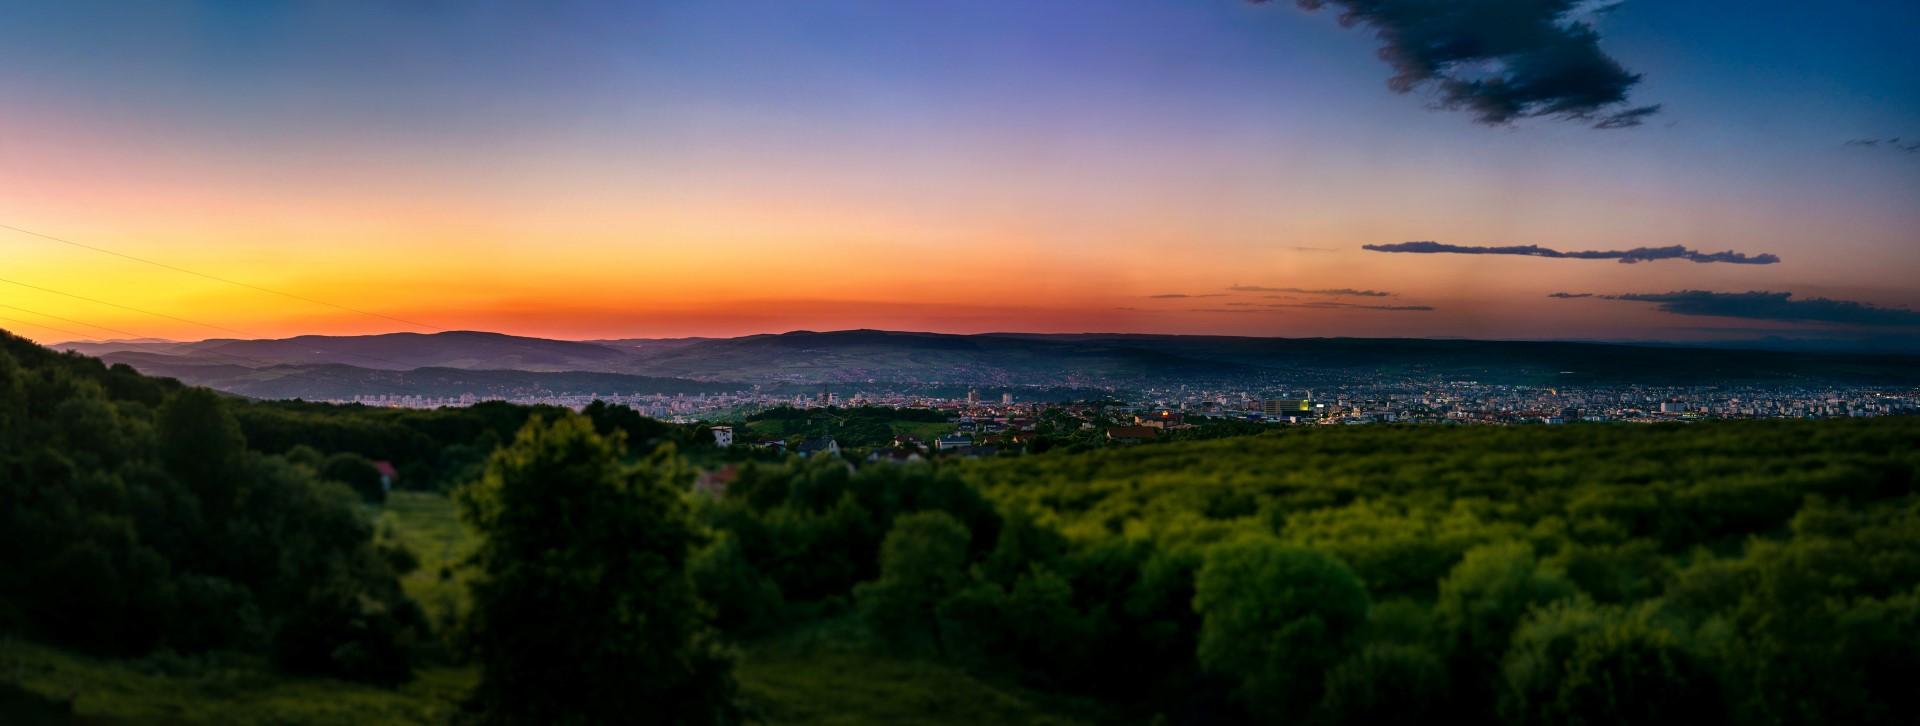 Colț de rai la doi pași de Cluj – Wonderland Cluj Resort